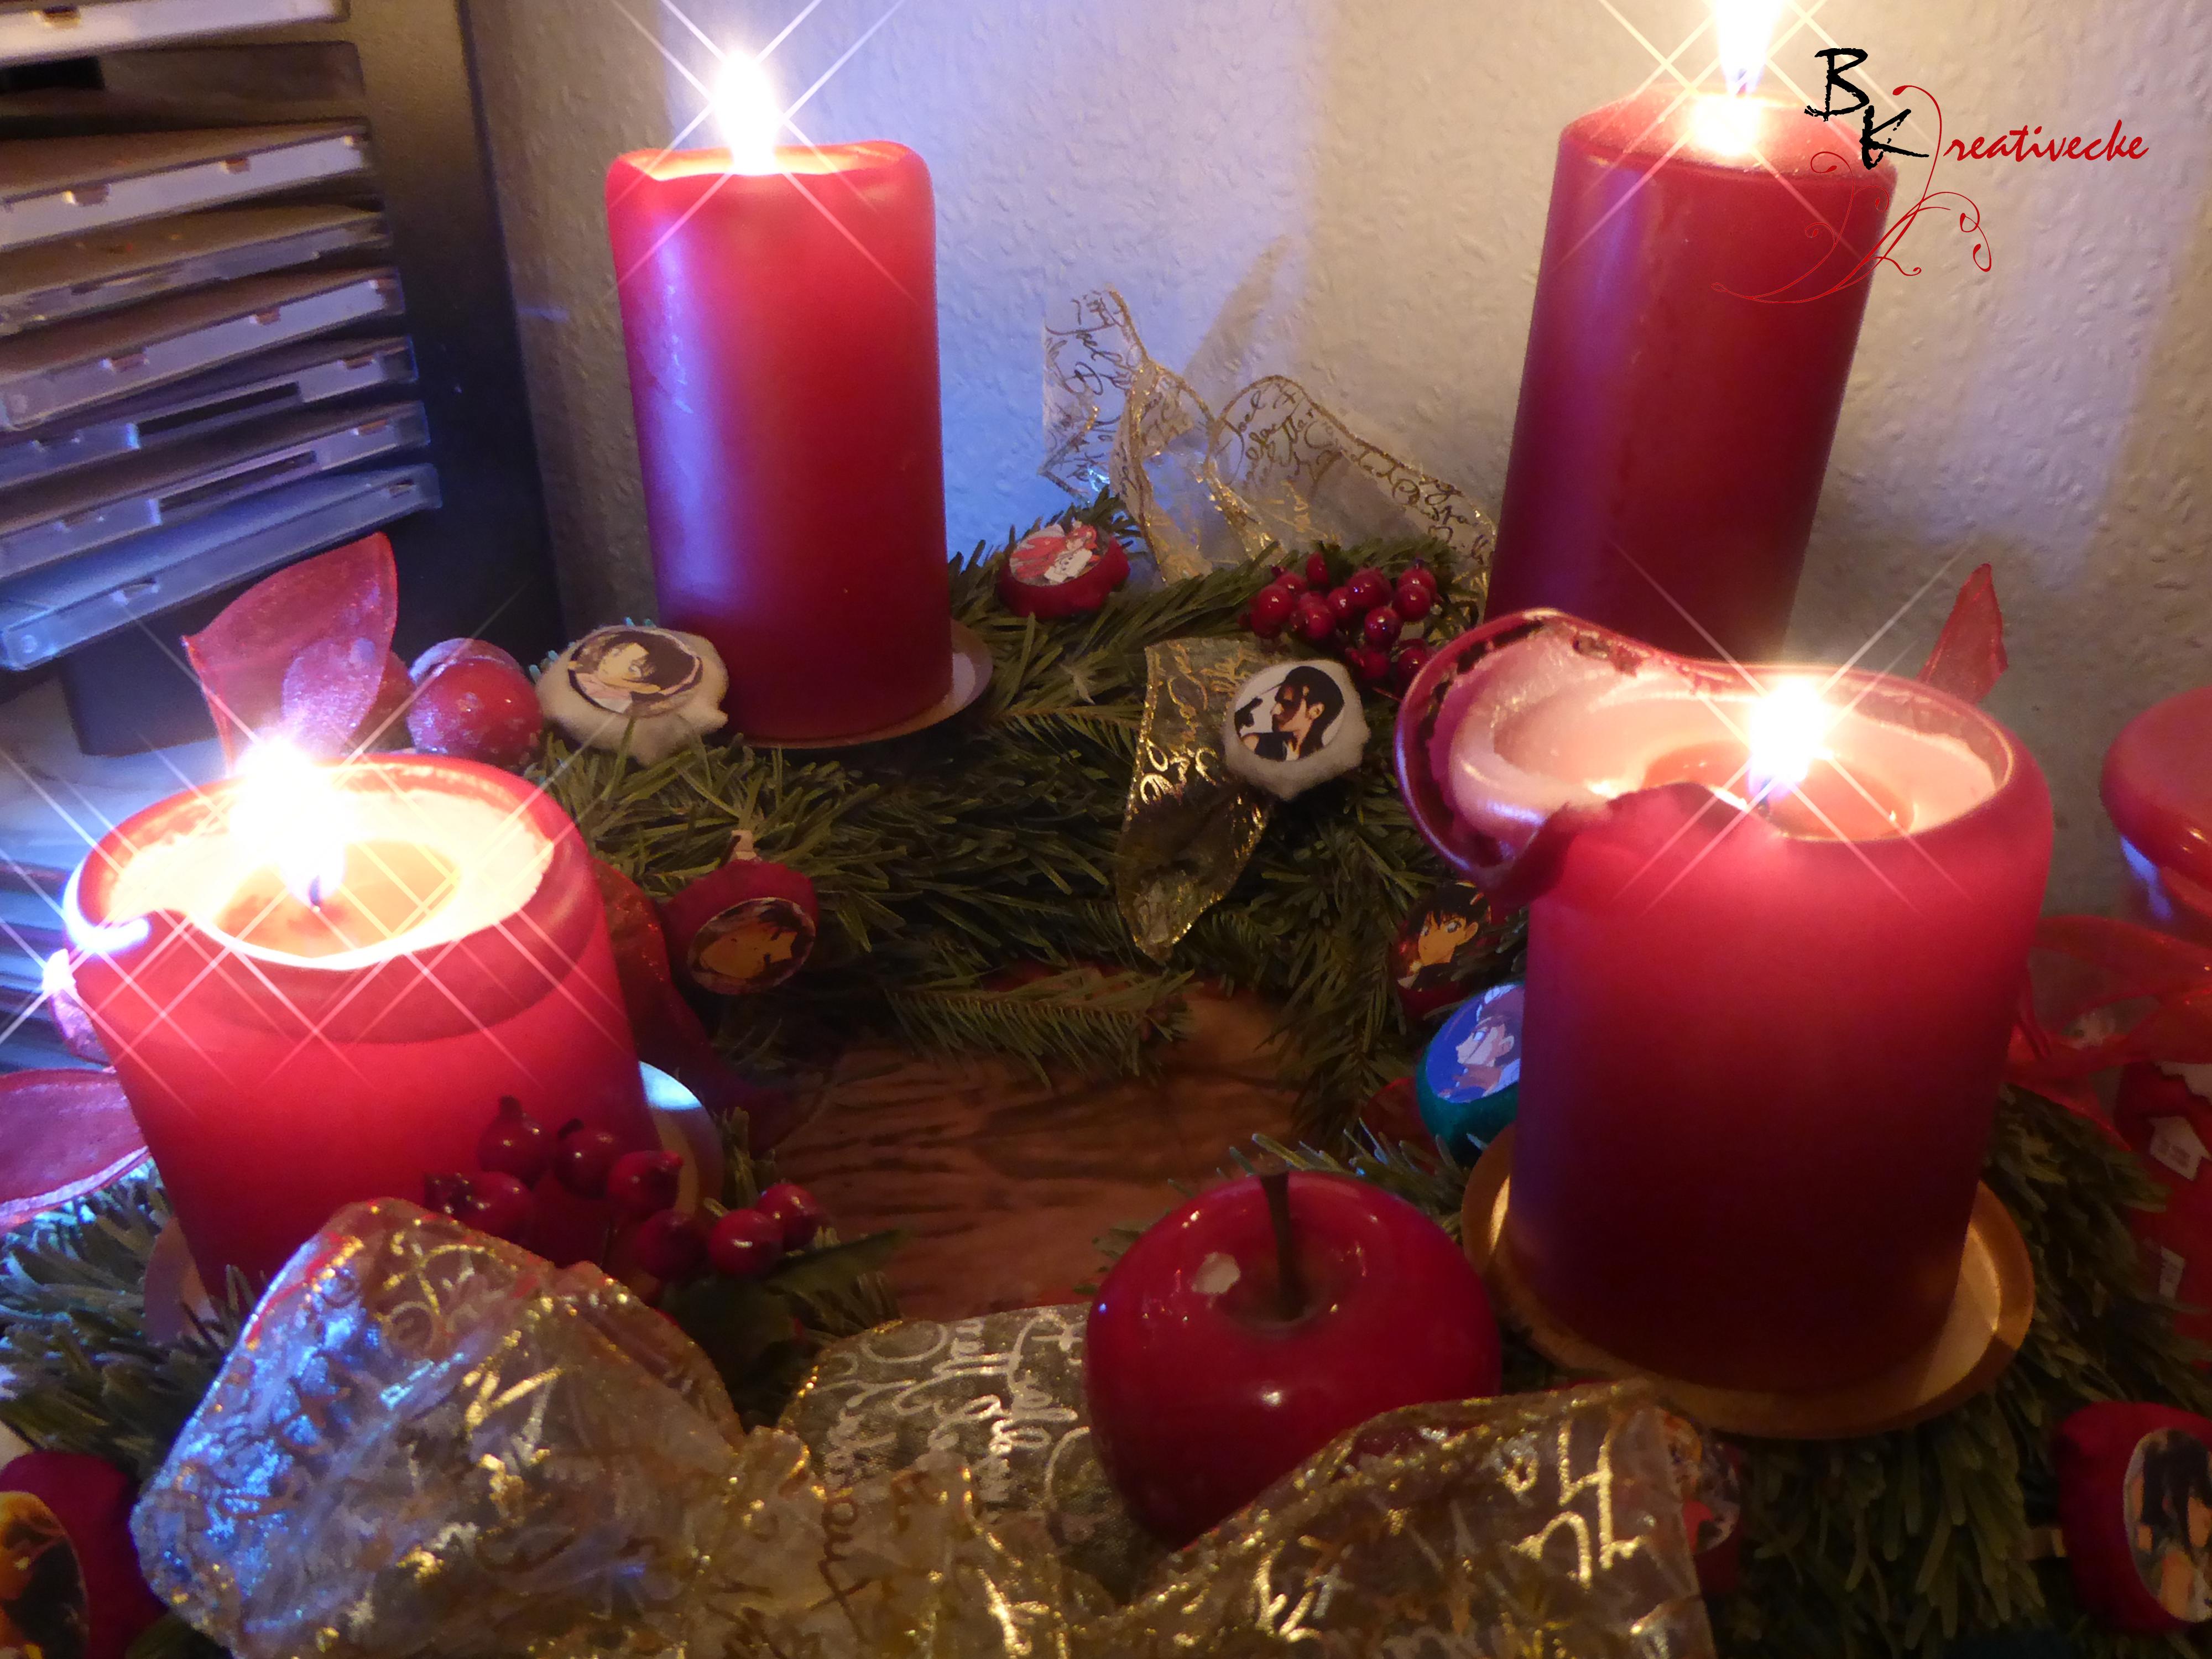 OAS 2017 – Online Advent Stocking | BK Kreativecke